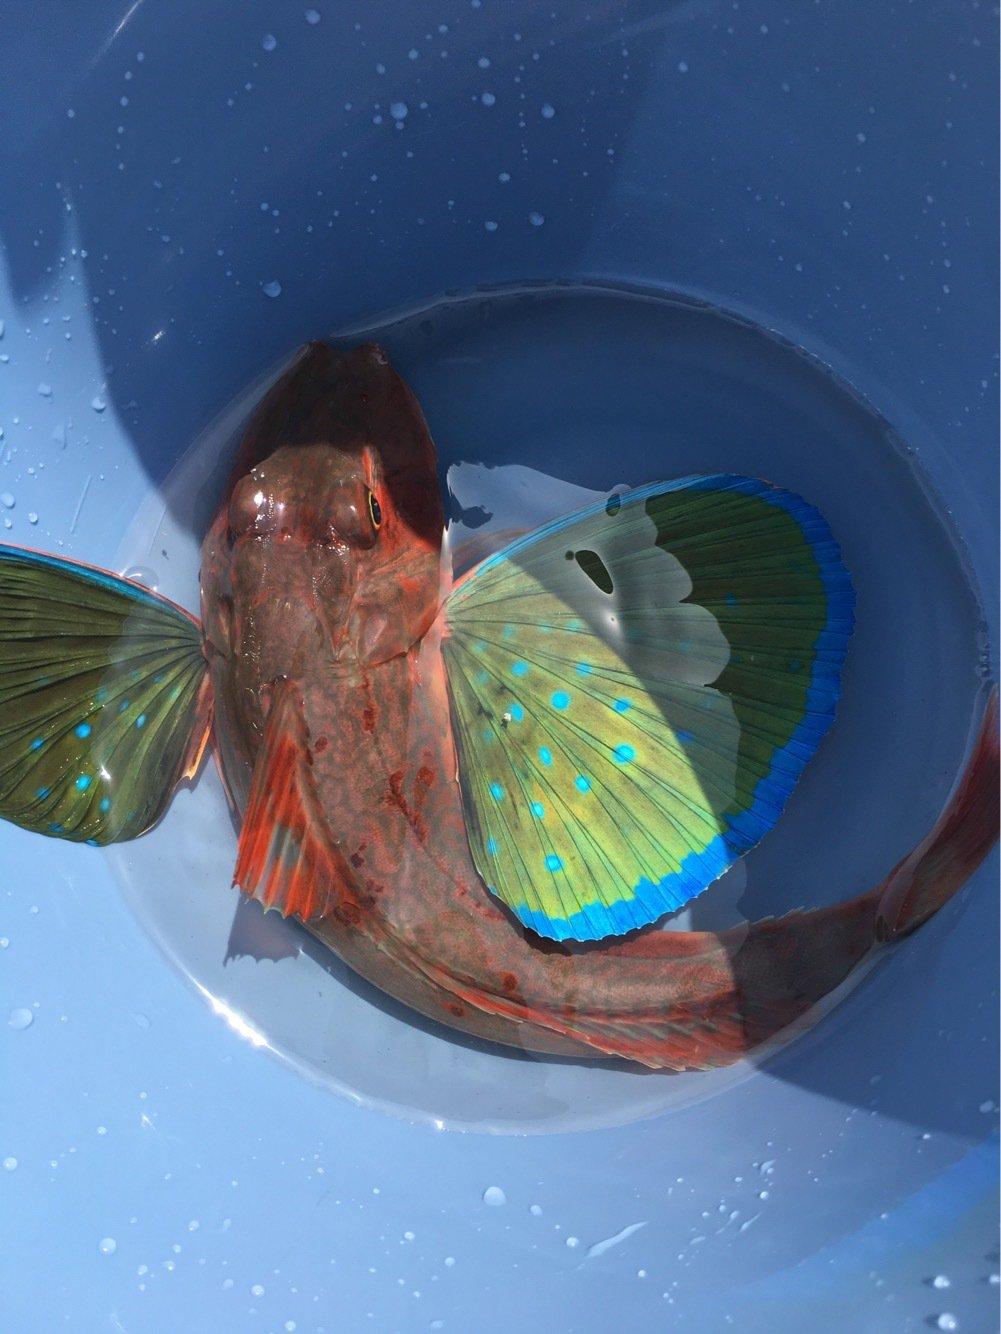 Daisukeさんの投稿画像,写っている魚はホウボウ